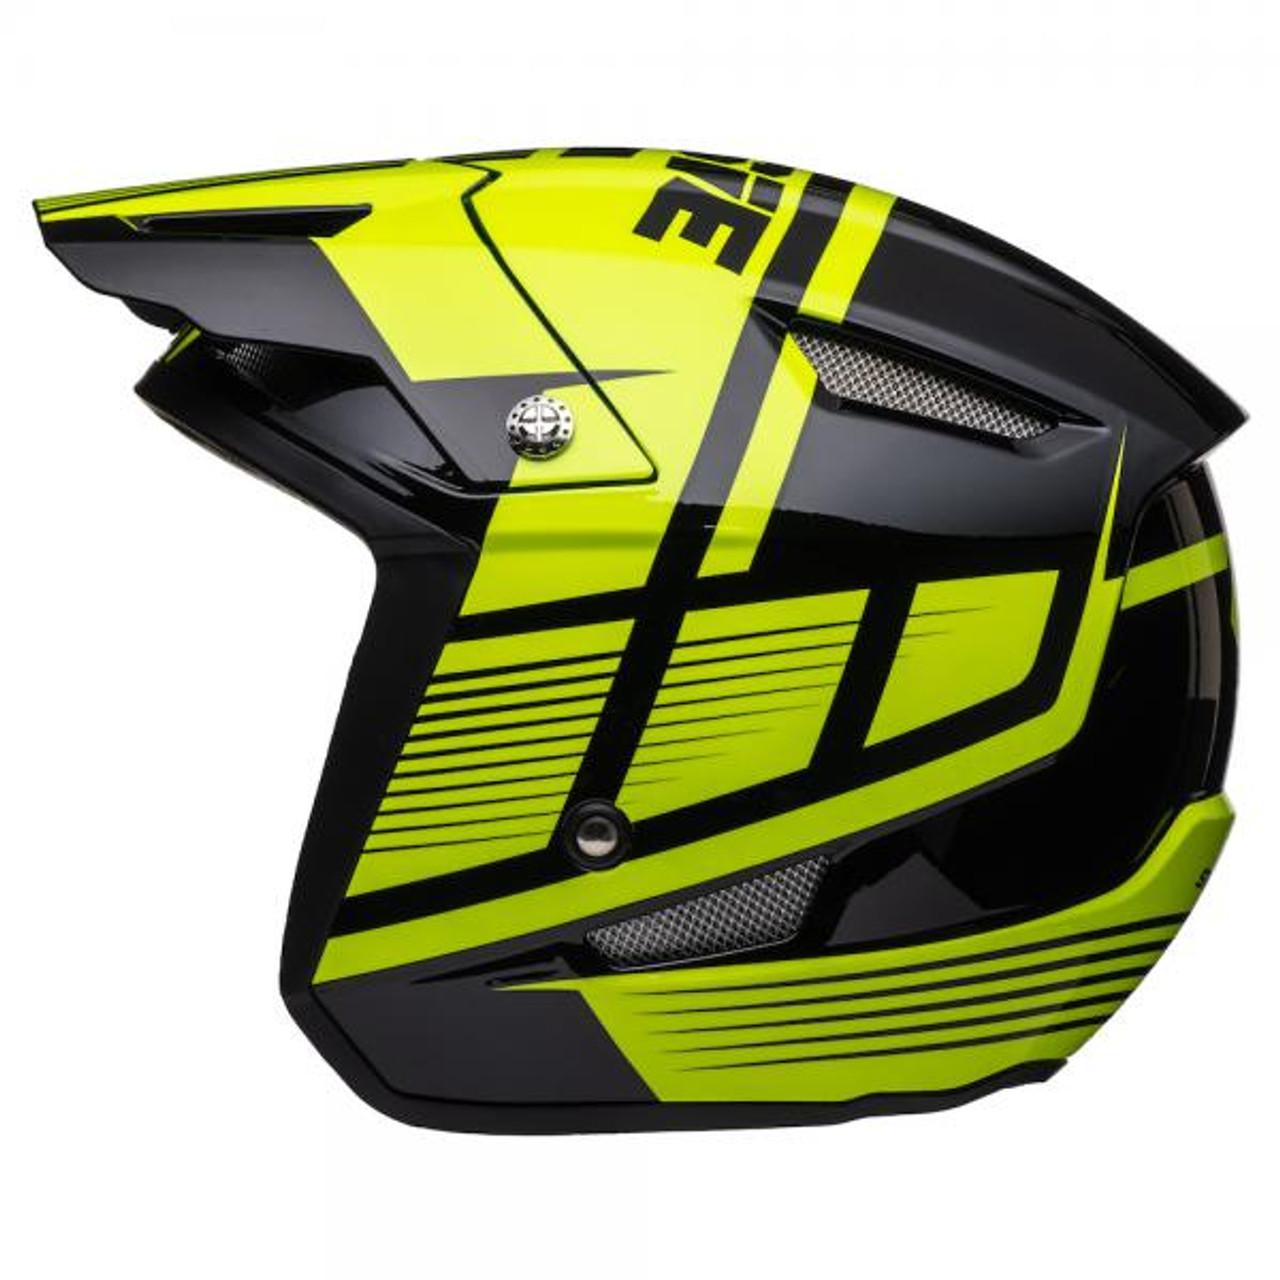 Helmet HT1 Struktur, black/ fluo yellow